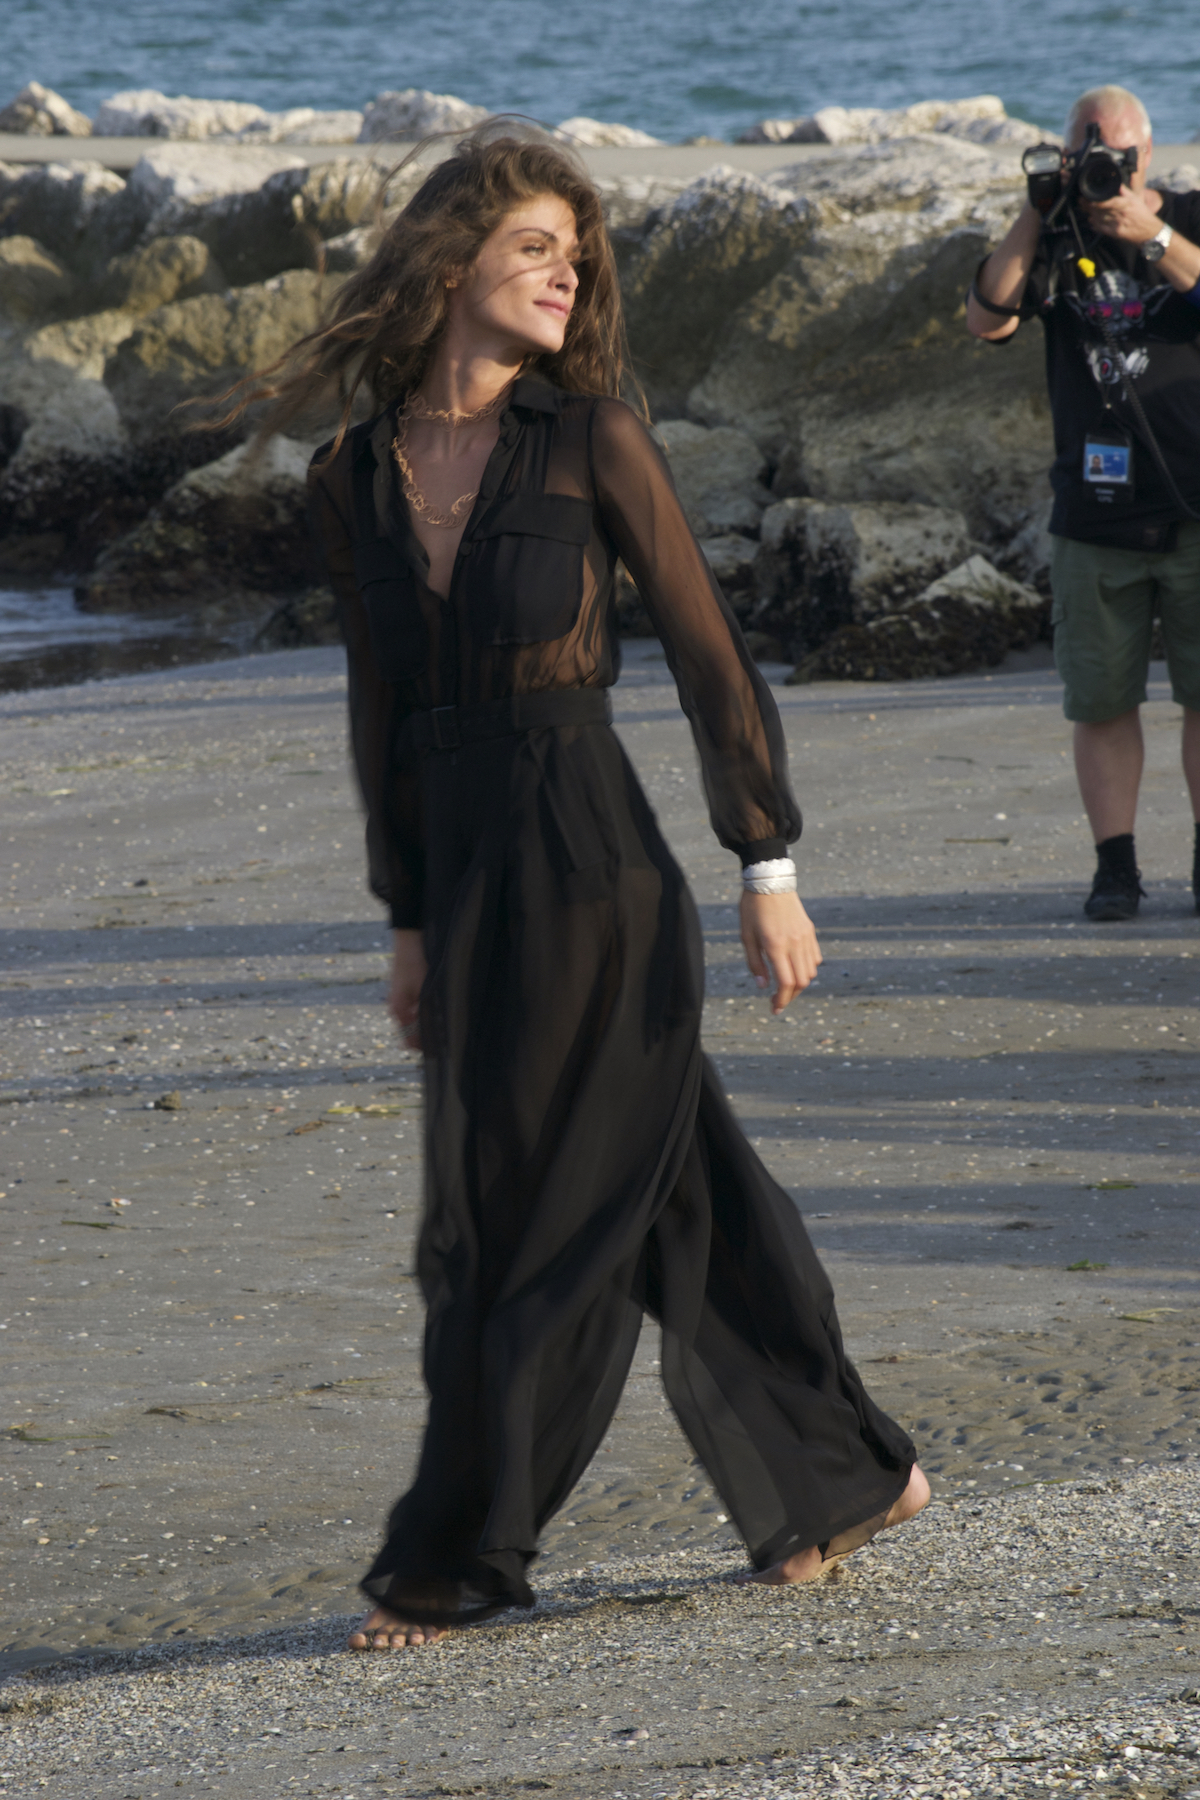 Venezia 2015: La madrina Elisa Sednaoui in spiaggia